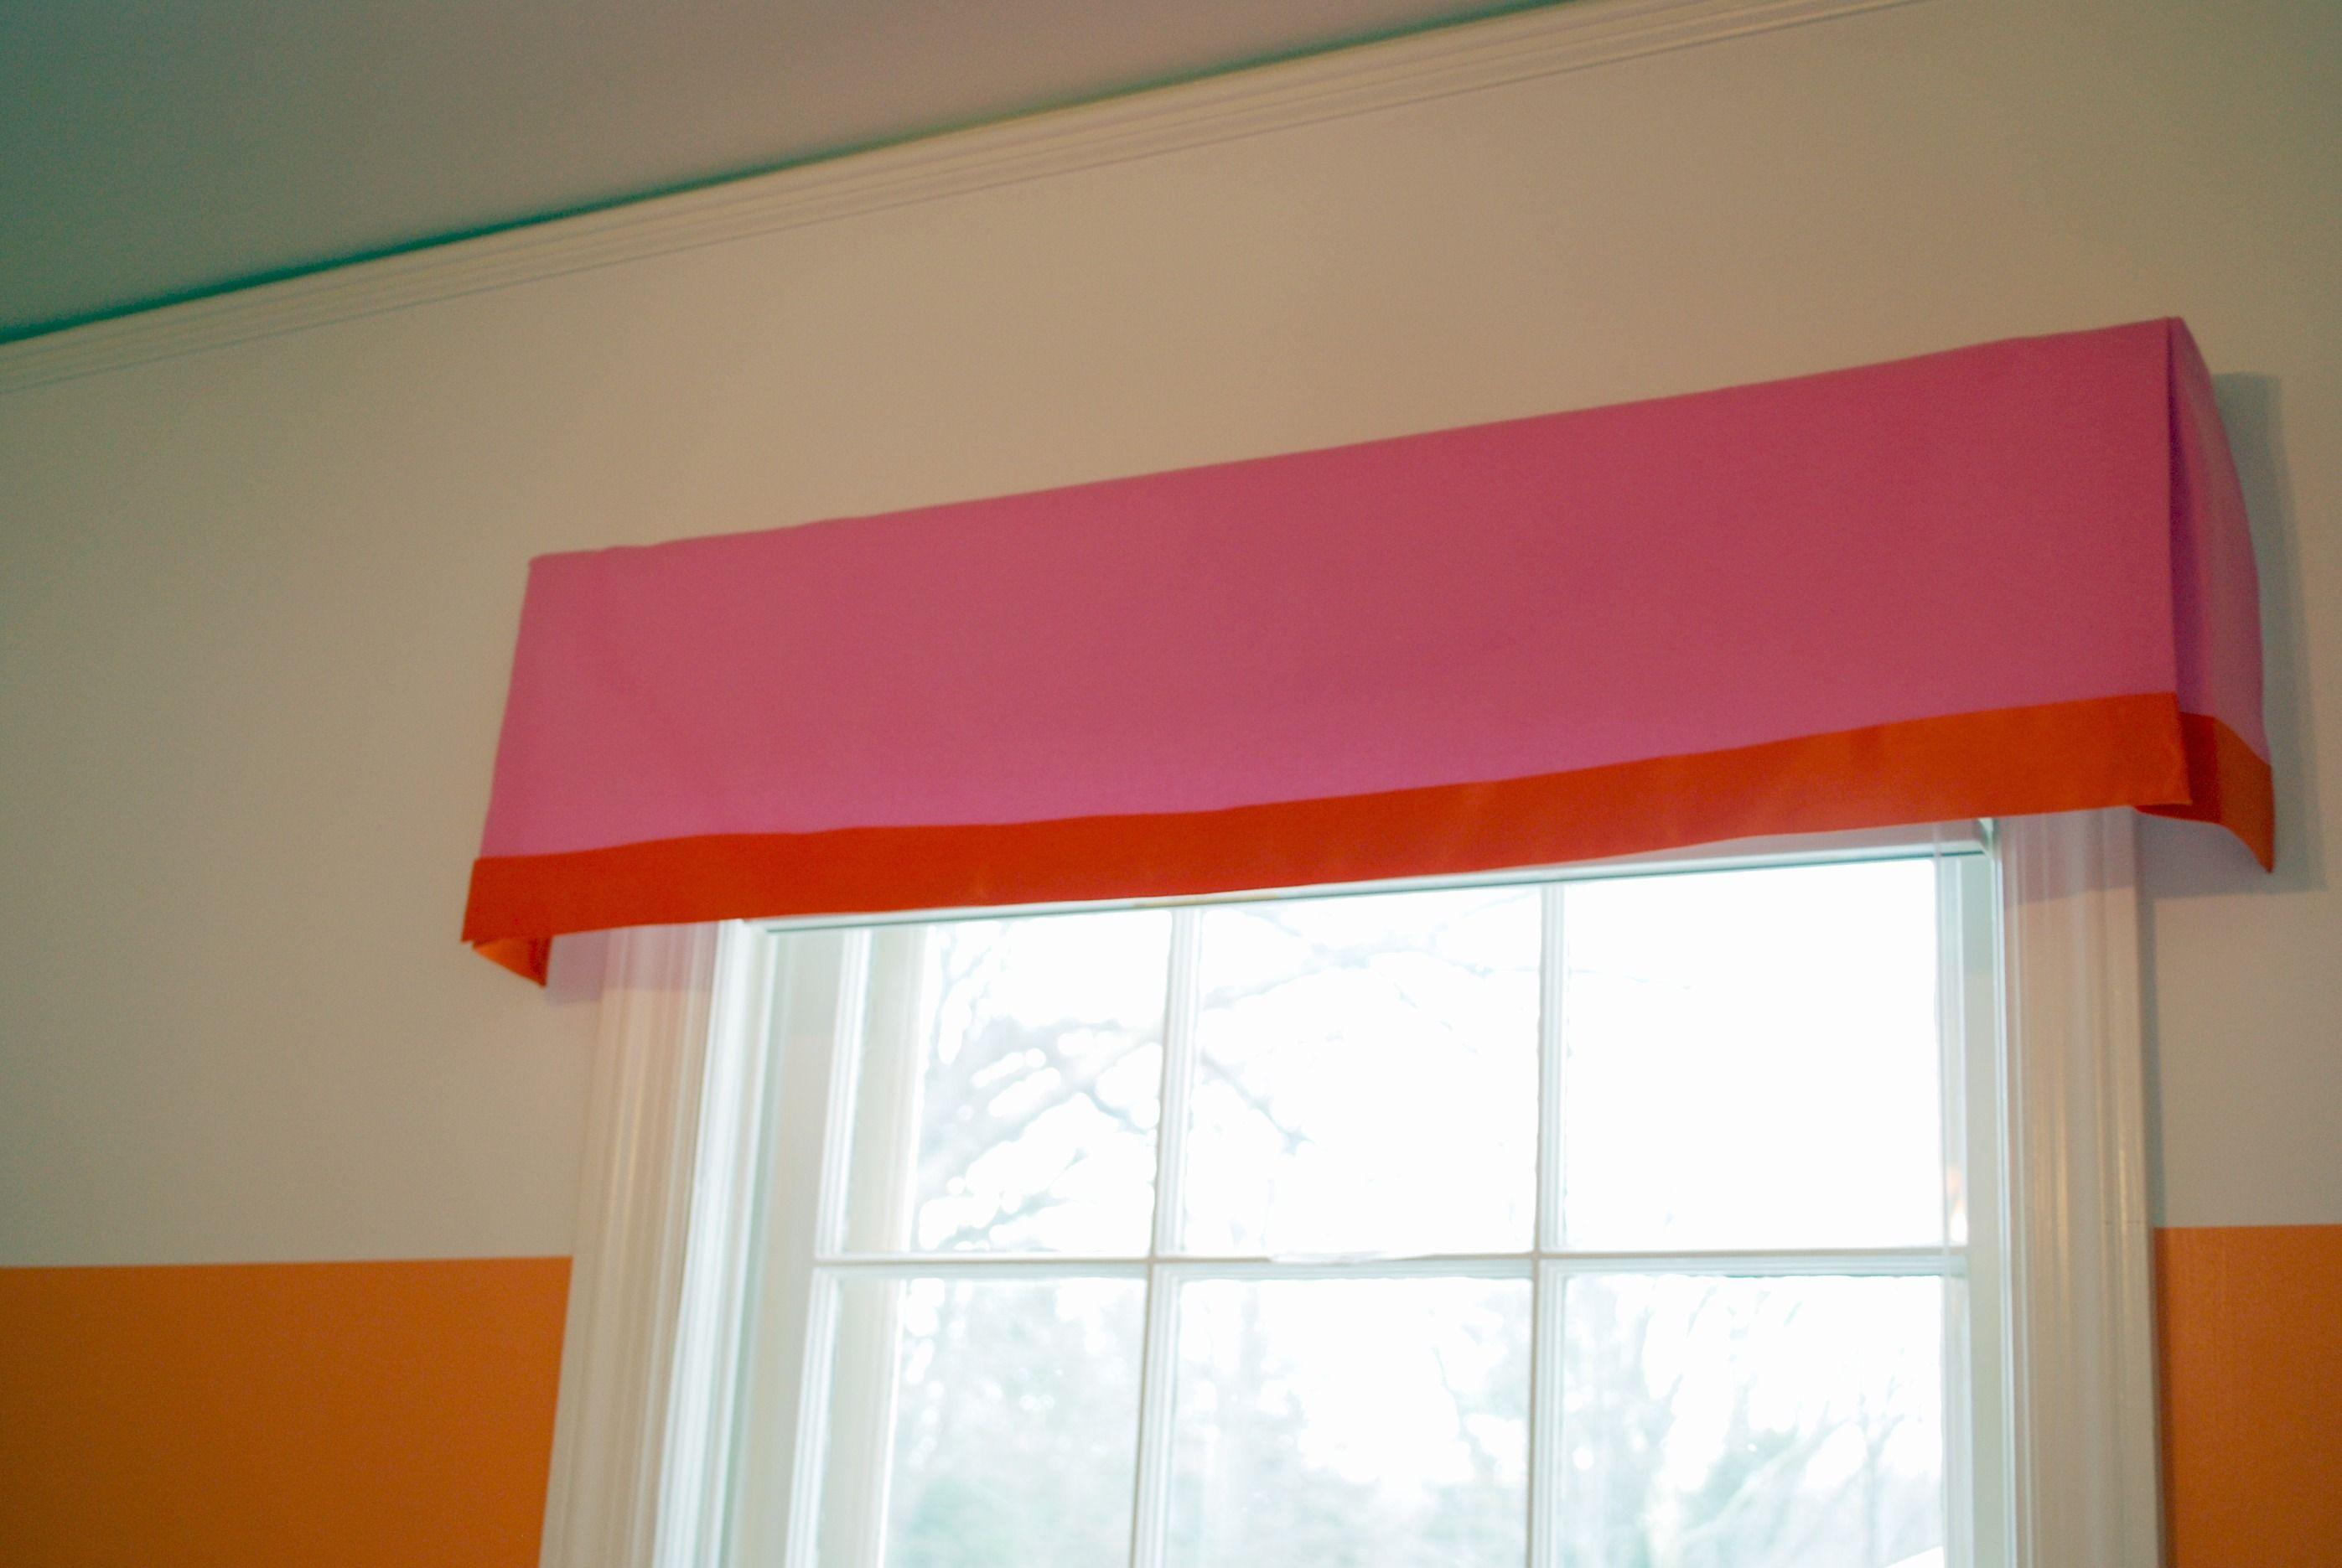 Diy No Sew Window Treatment Box Pleat Valance Fabric